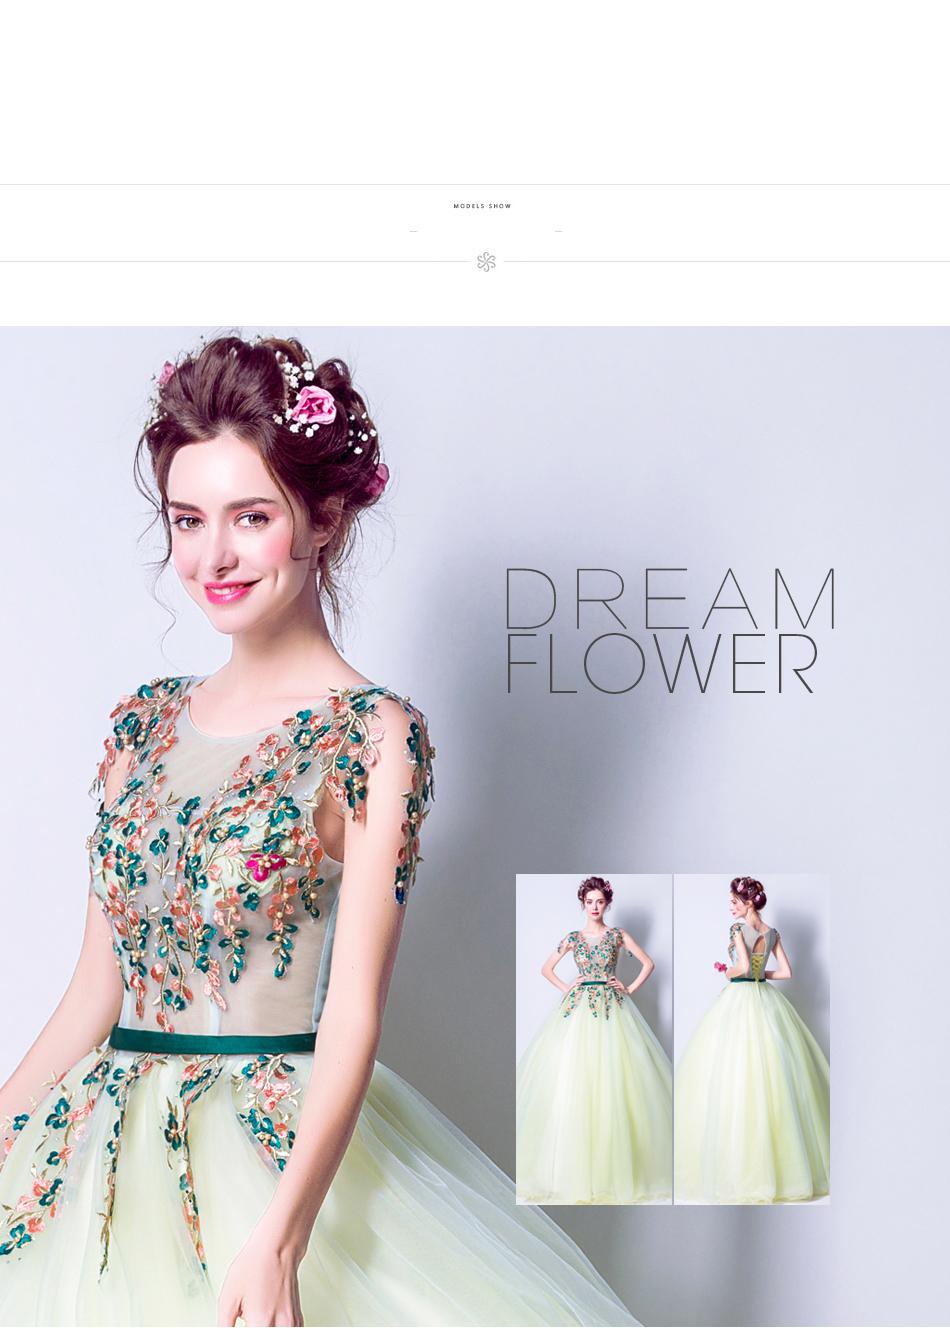 Angel Wedding Dress Marriage Bride Bridal Gown Vestido De Noiva 2017 Green, embroidery, the wizard of Oz 2217 5